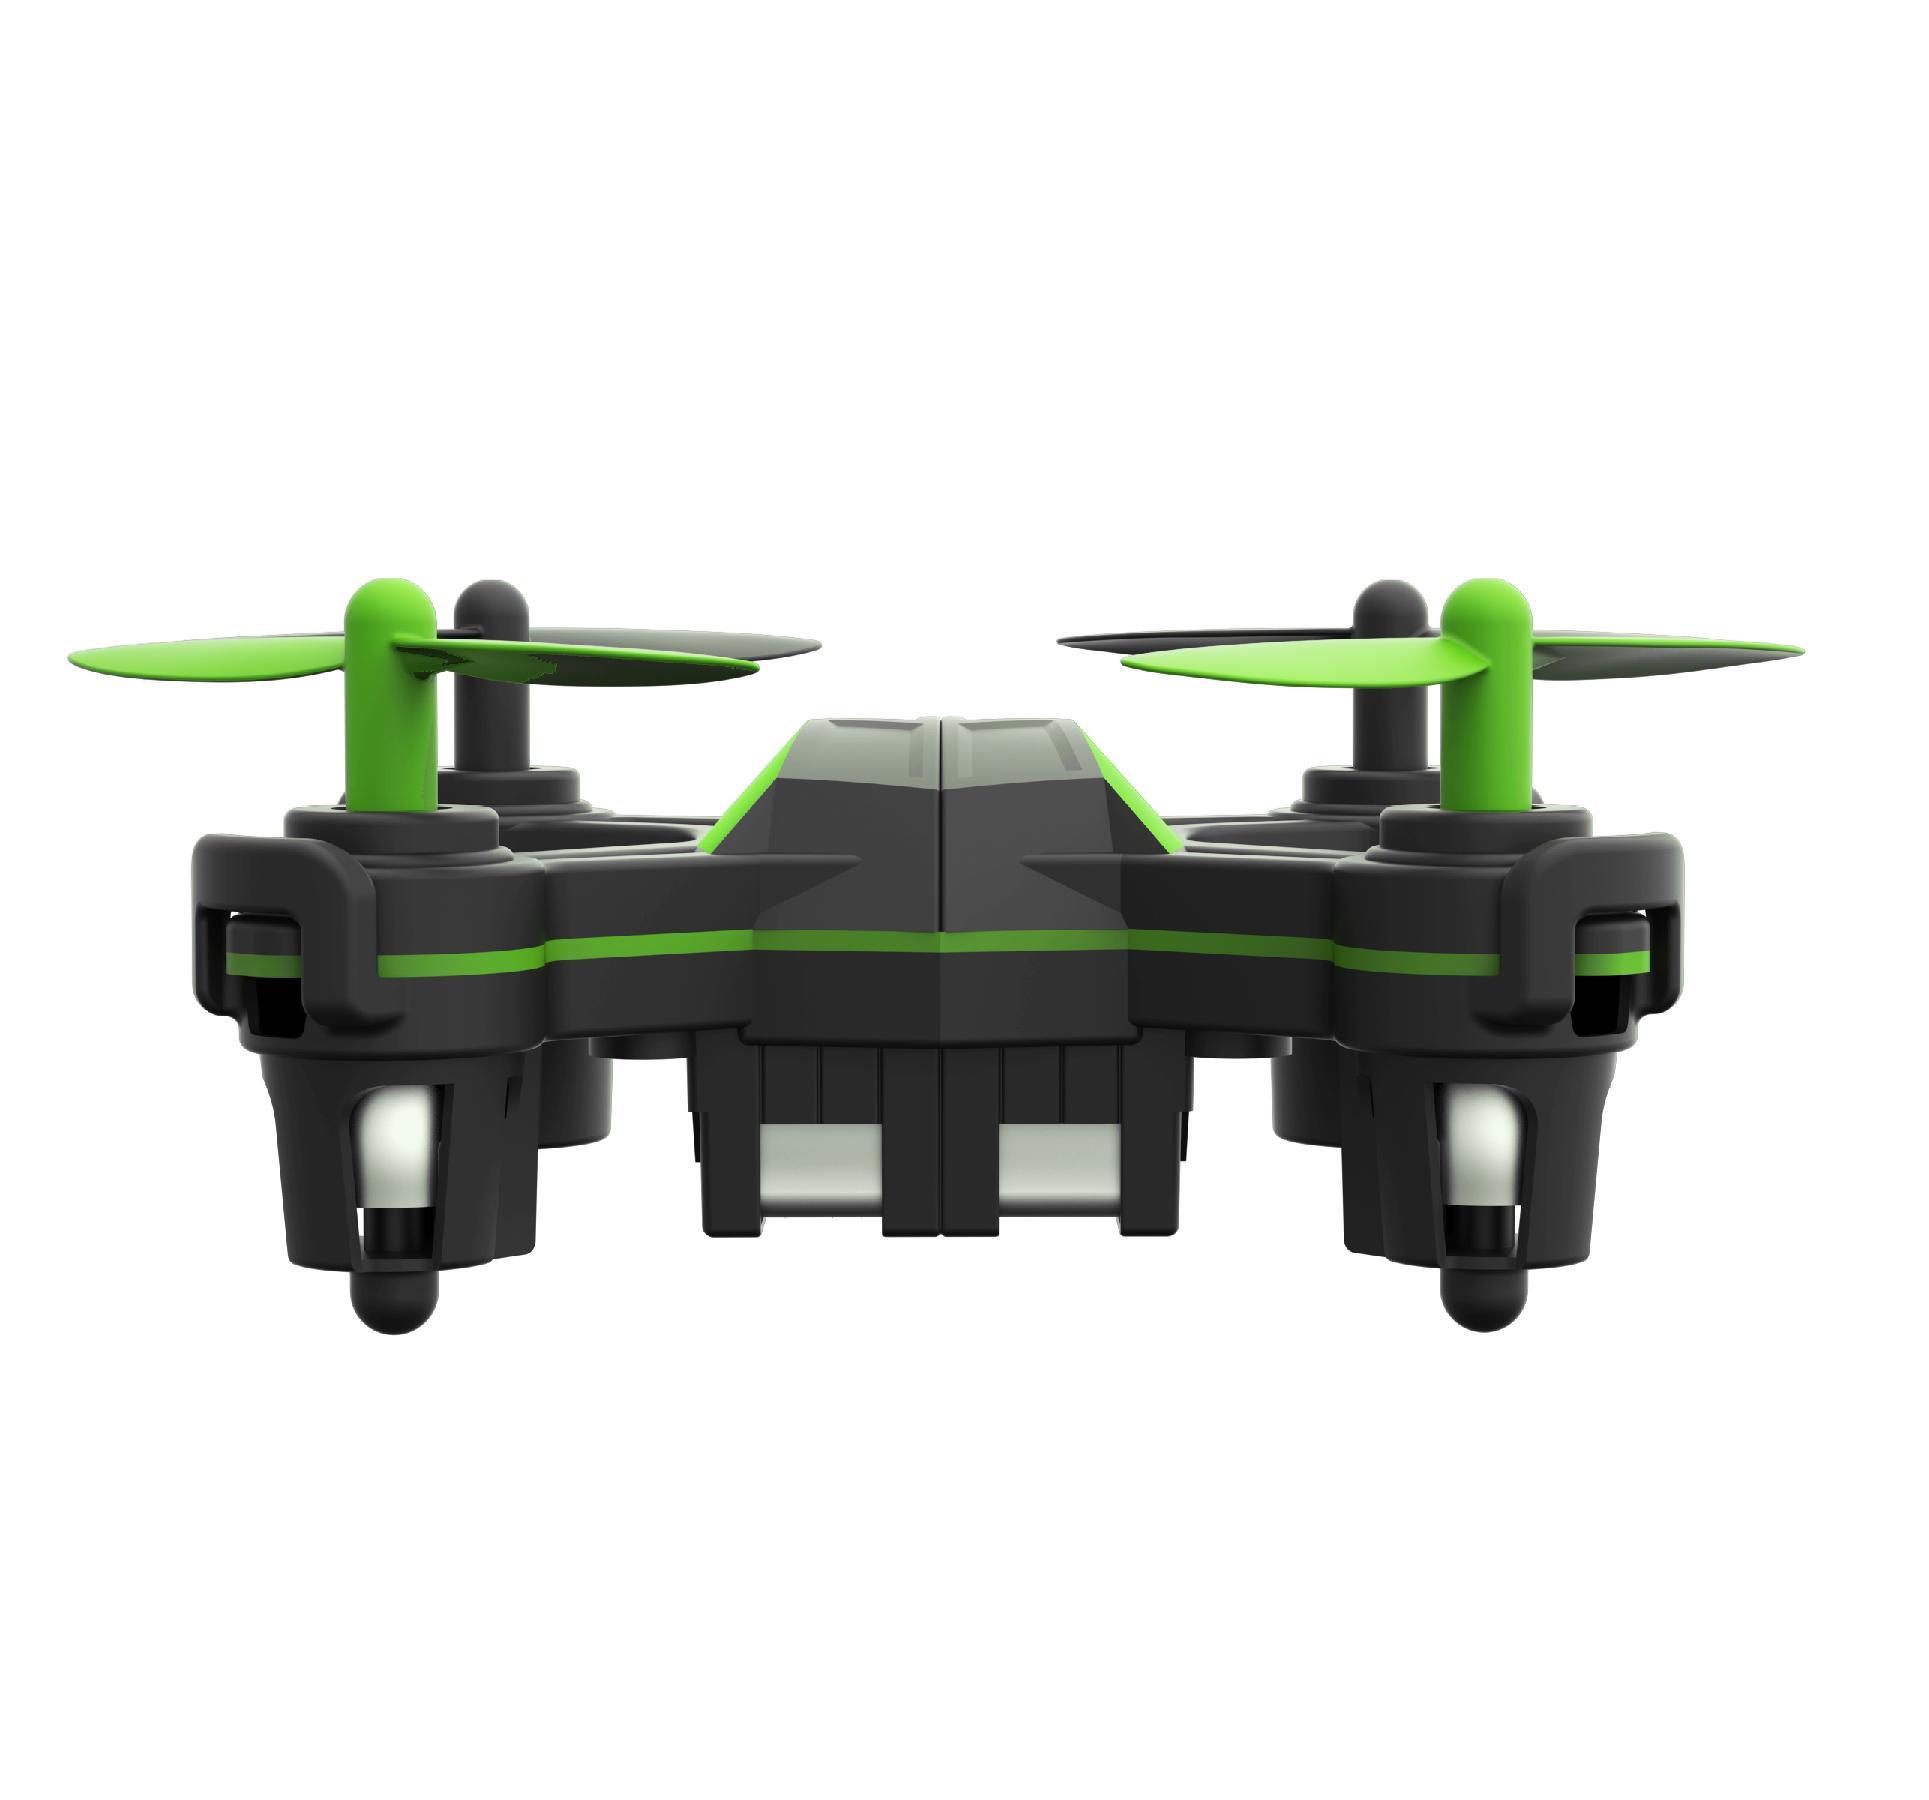 Amazoncom Sky Viper Nano Drone M200 Vehicle Discontinued By